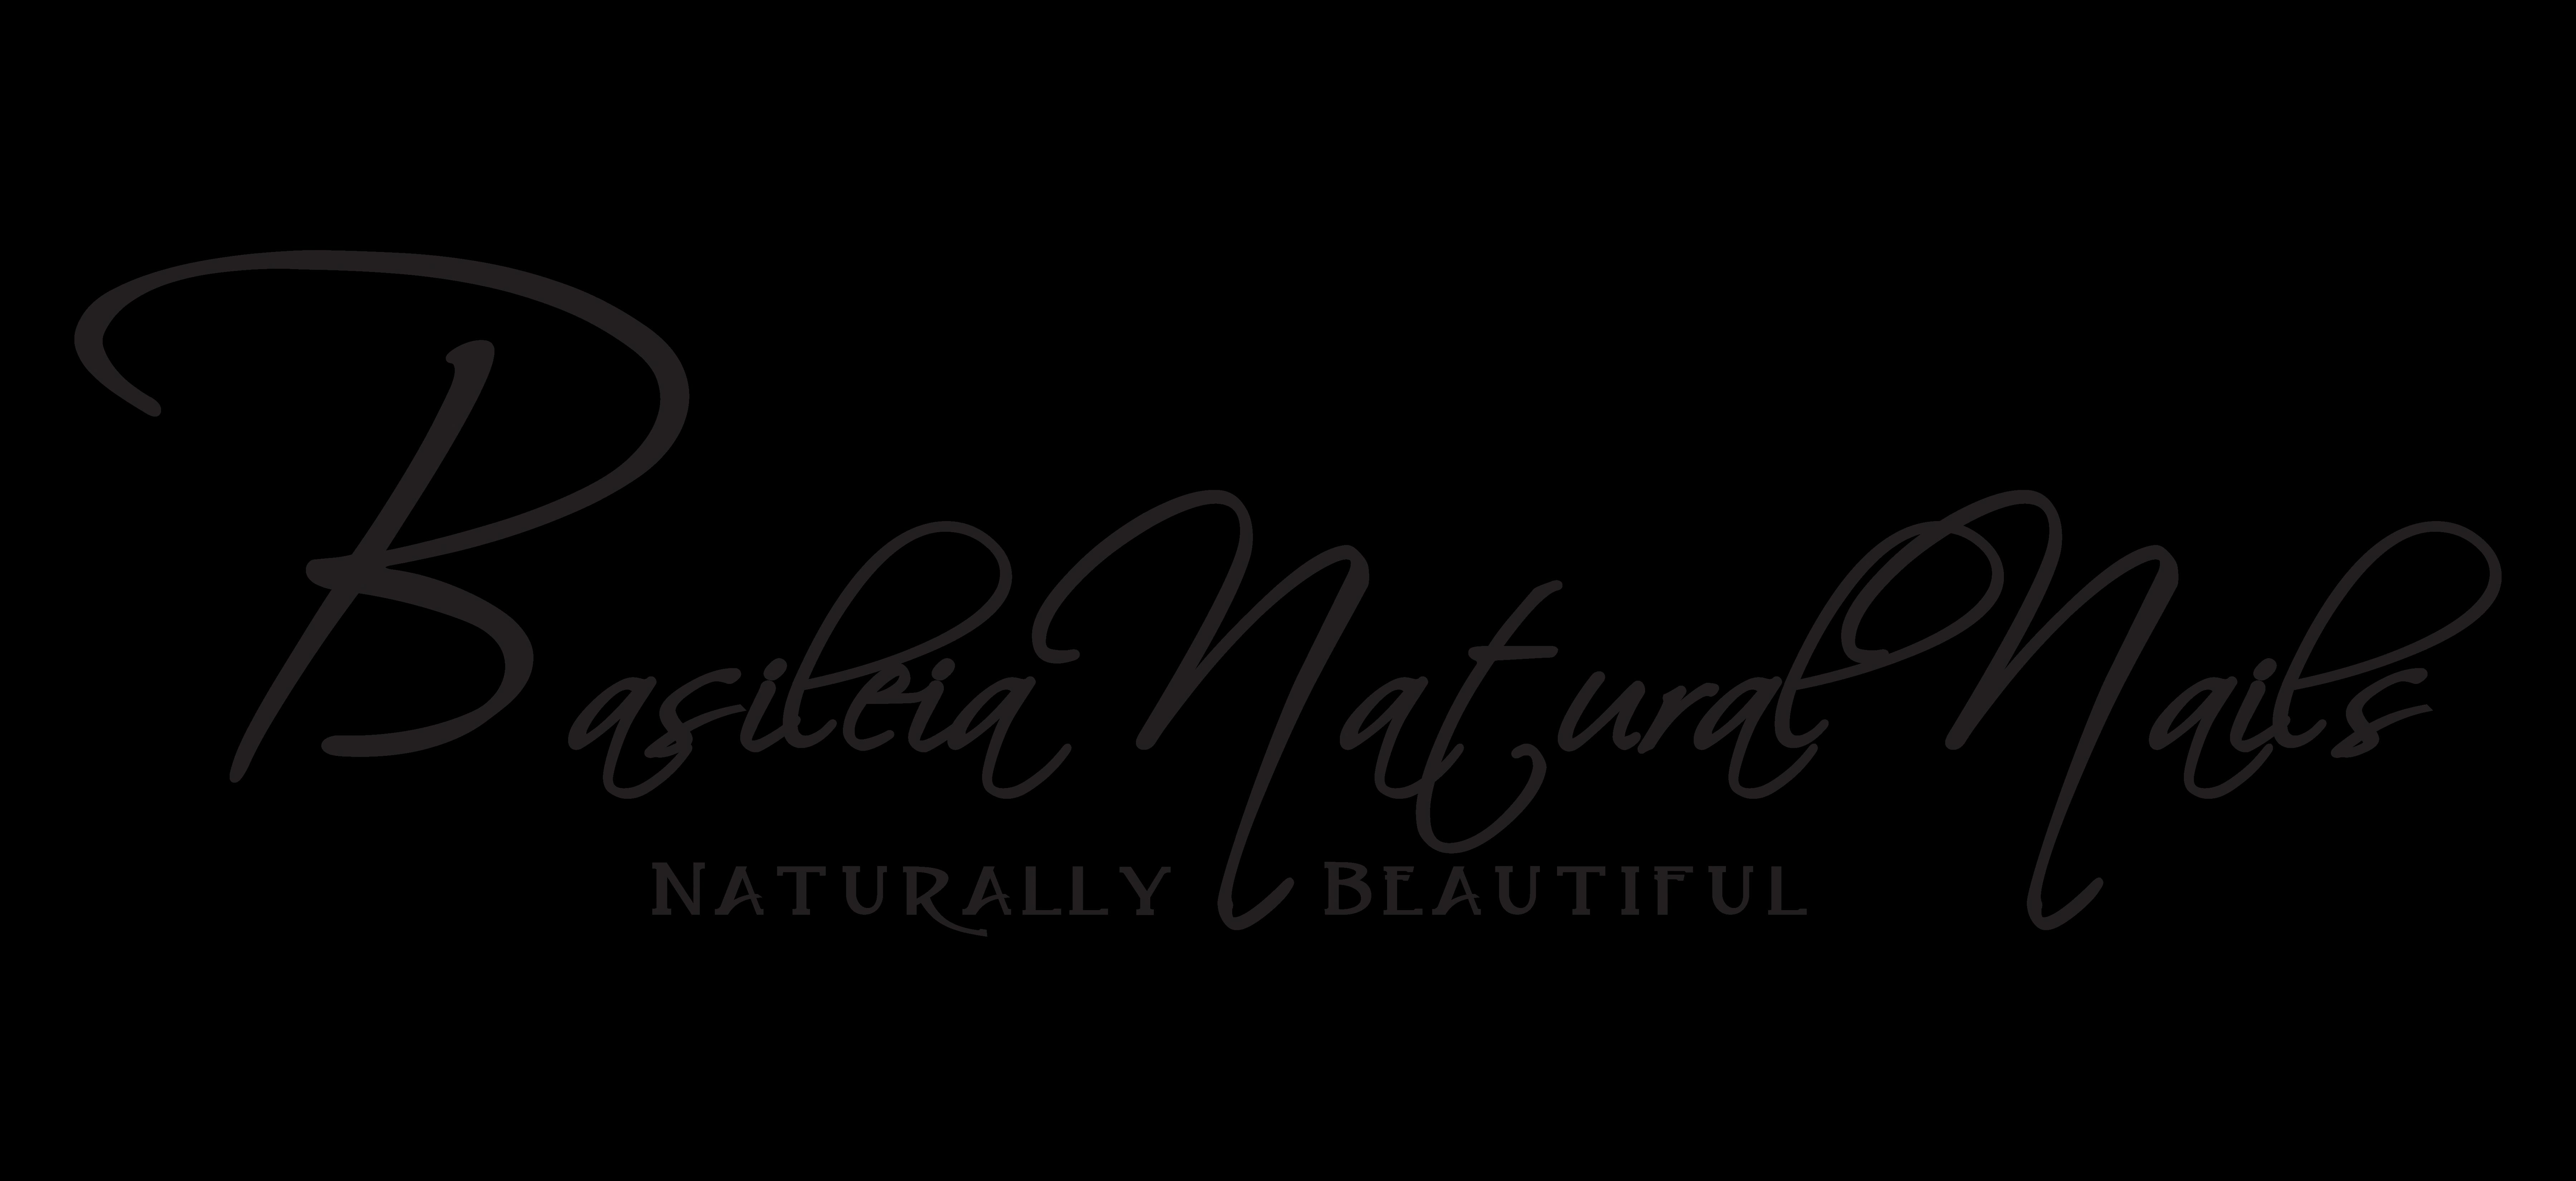 Basileia Natural Nails Salon